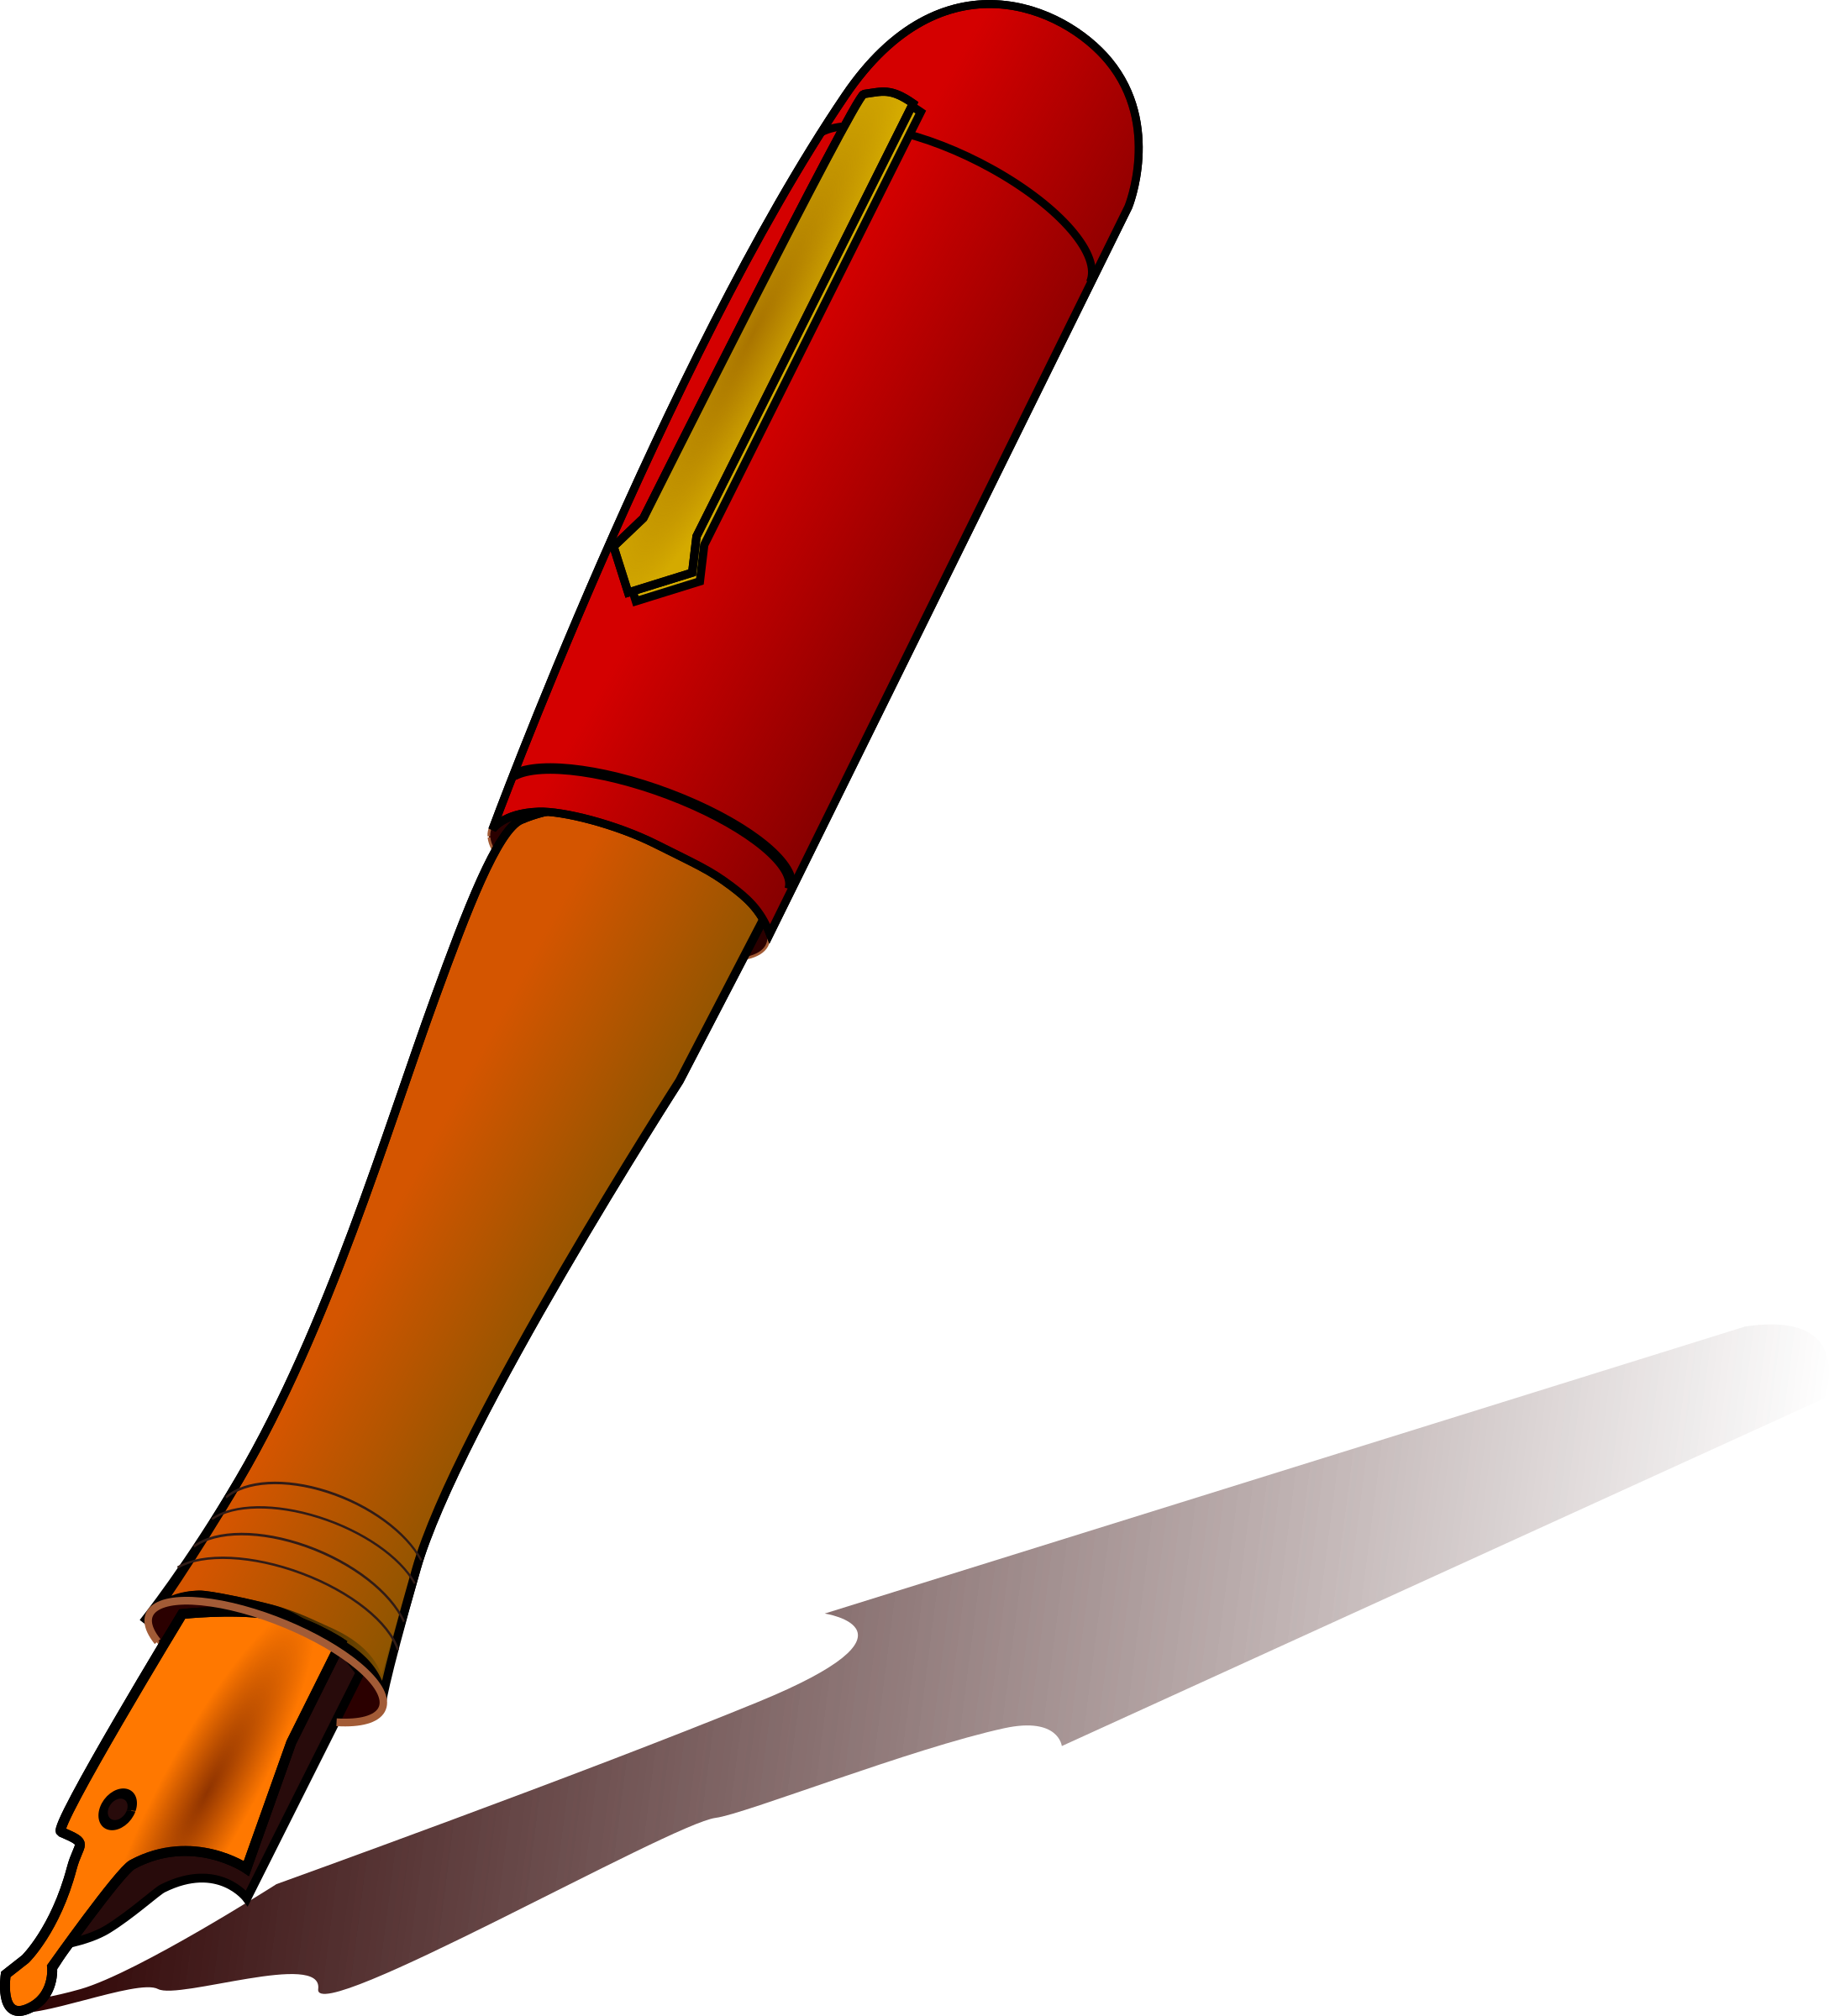 vector free download Pen big image png. Writer clipart kalam